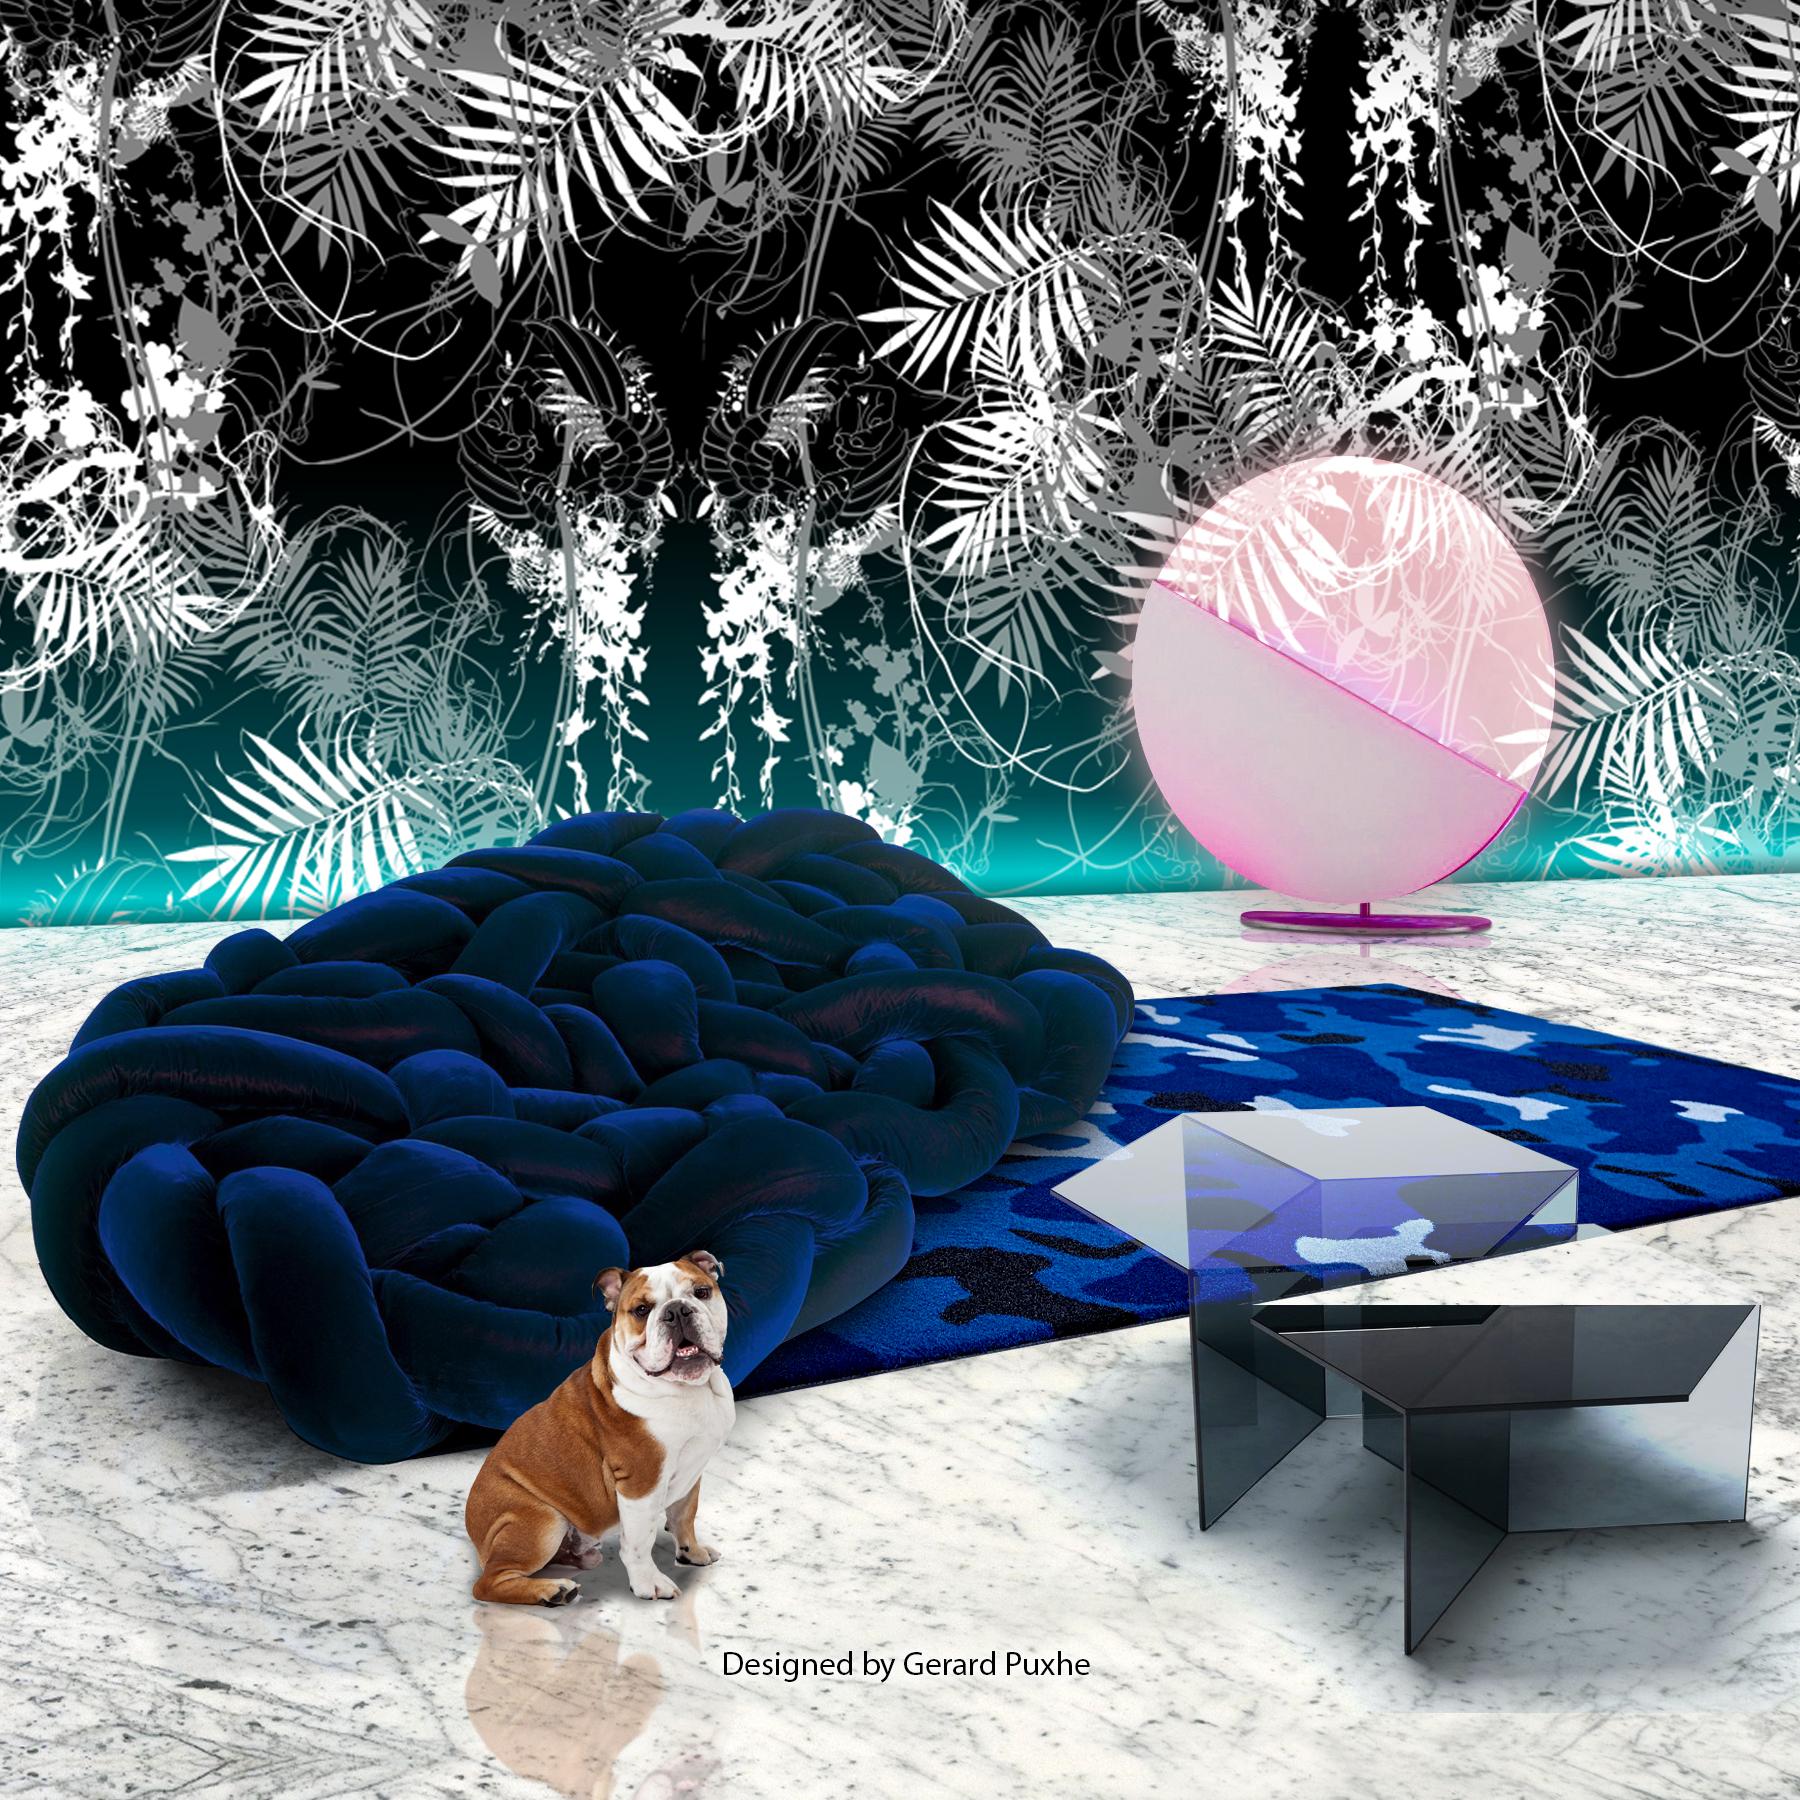 Wild Life - Interior design by Gerard Puxhe